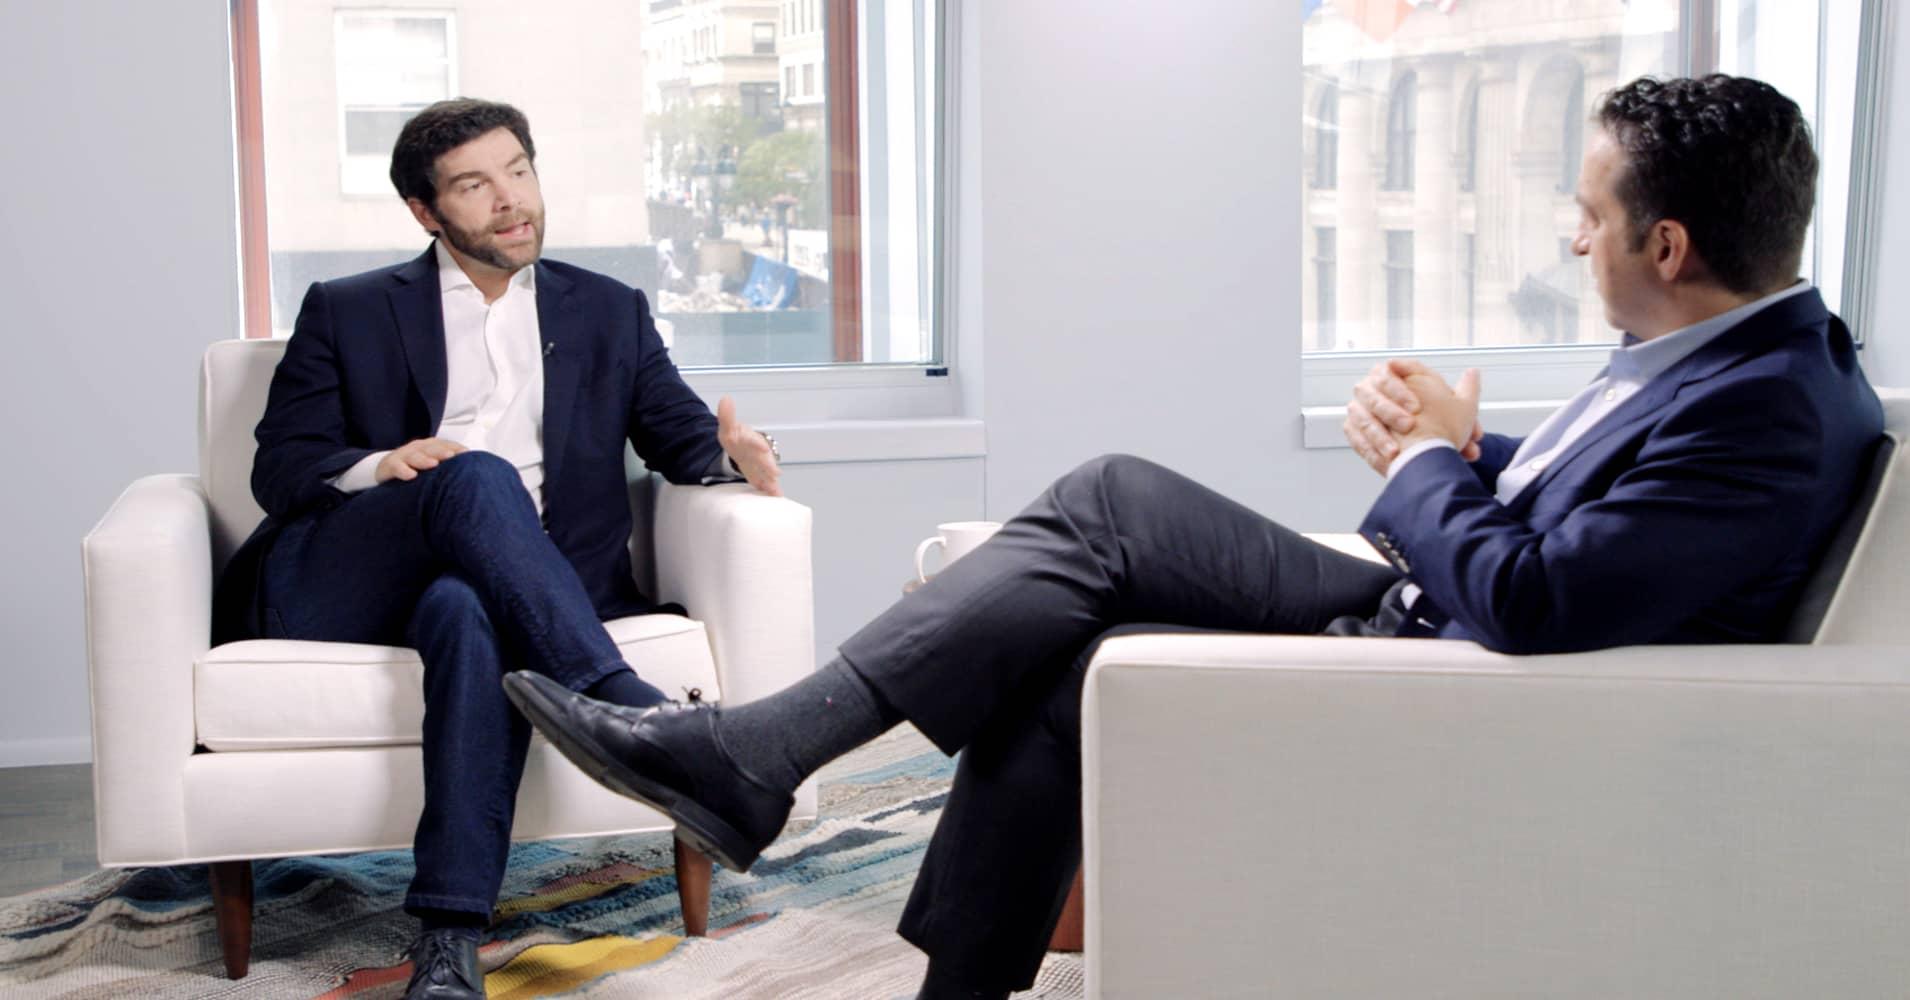 Linkedin Ceo Jeff Weiner Advice On Leadership Hiring And Firing